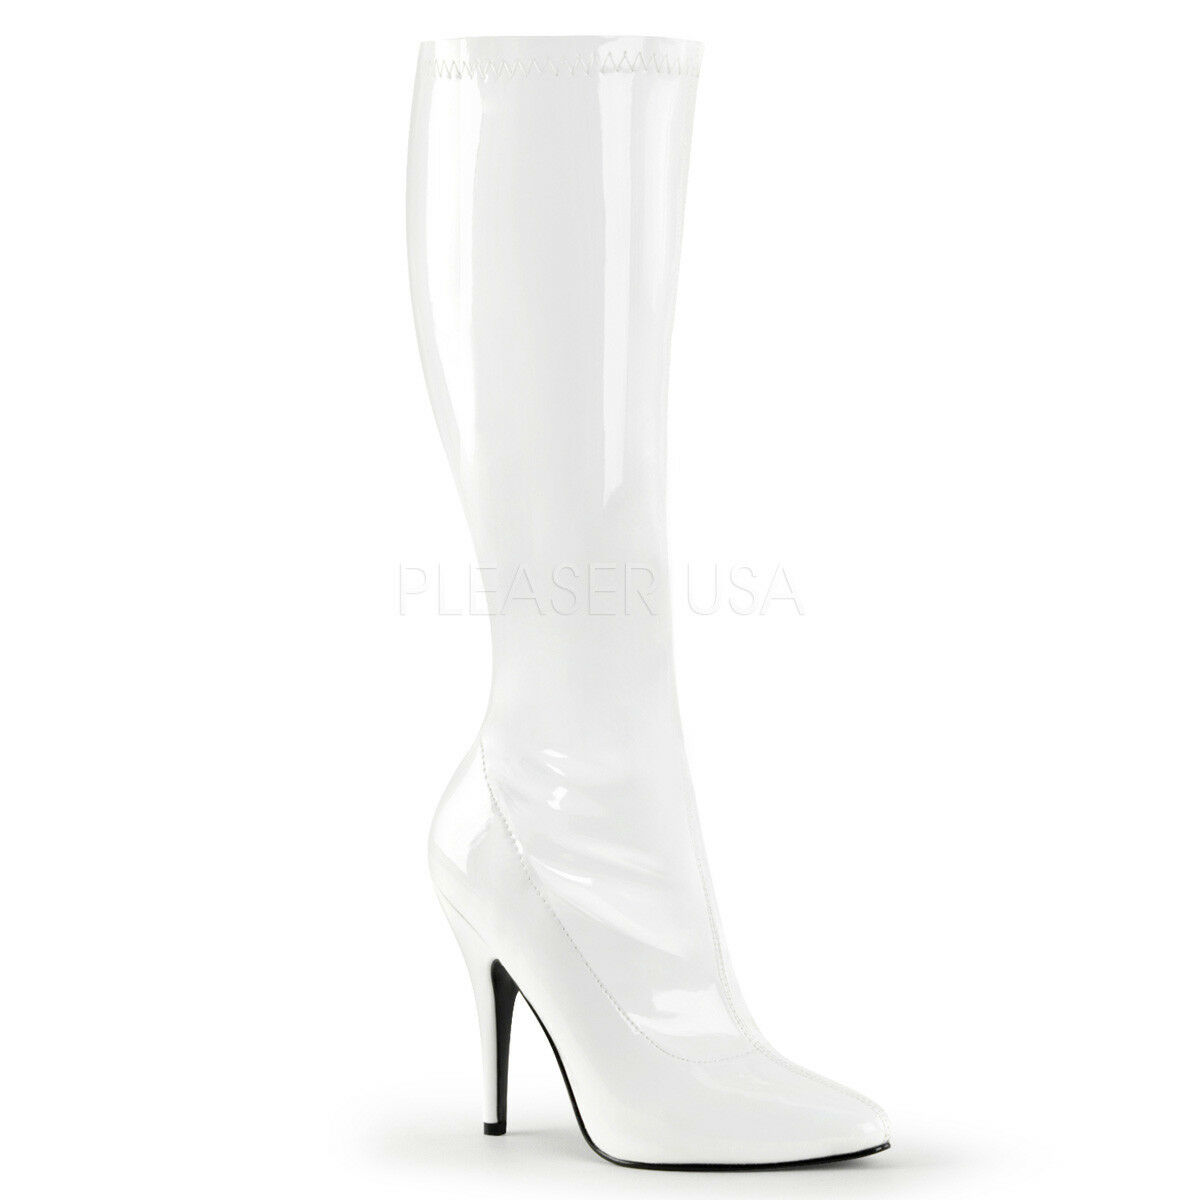 marca Pleaser SEDUCE-2000 Donna  bianca Patent Heels Plain Stretch Side Side Side Zip Knee avvio  miglior prezzo migliore